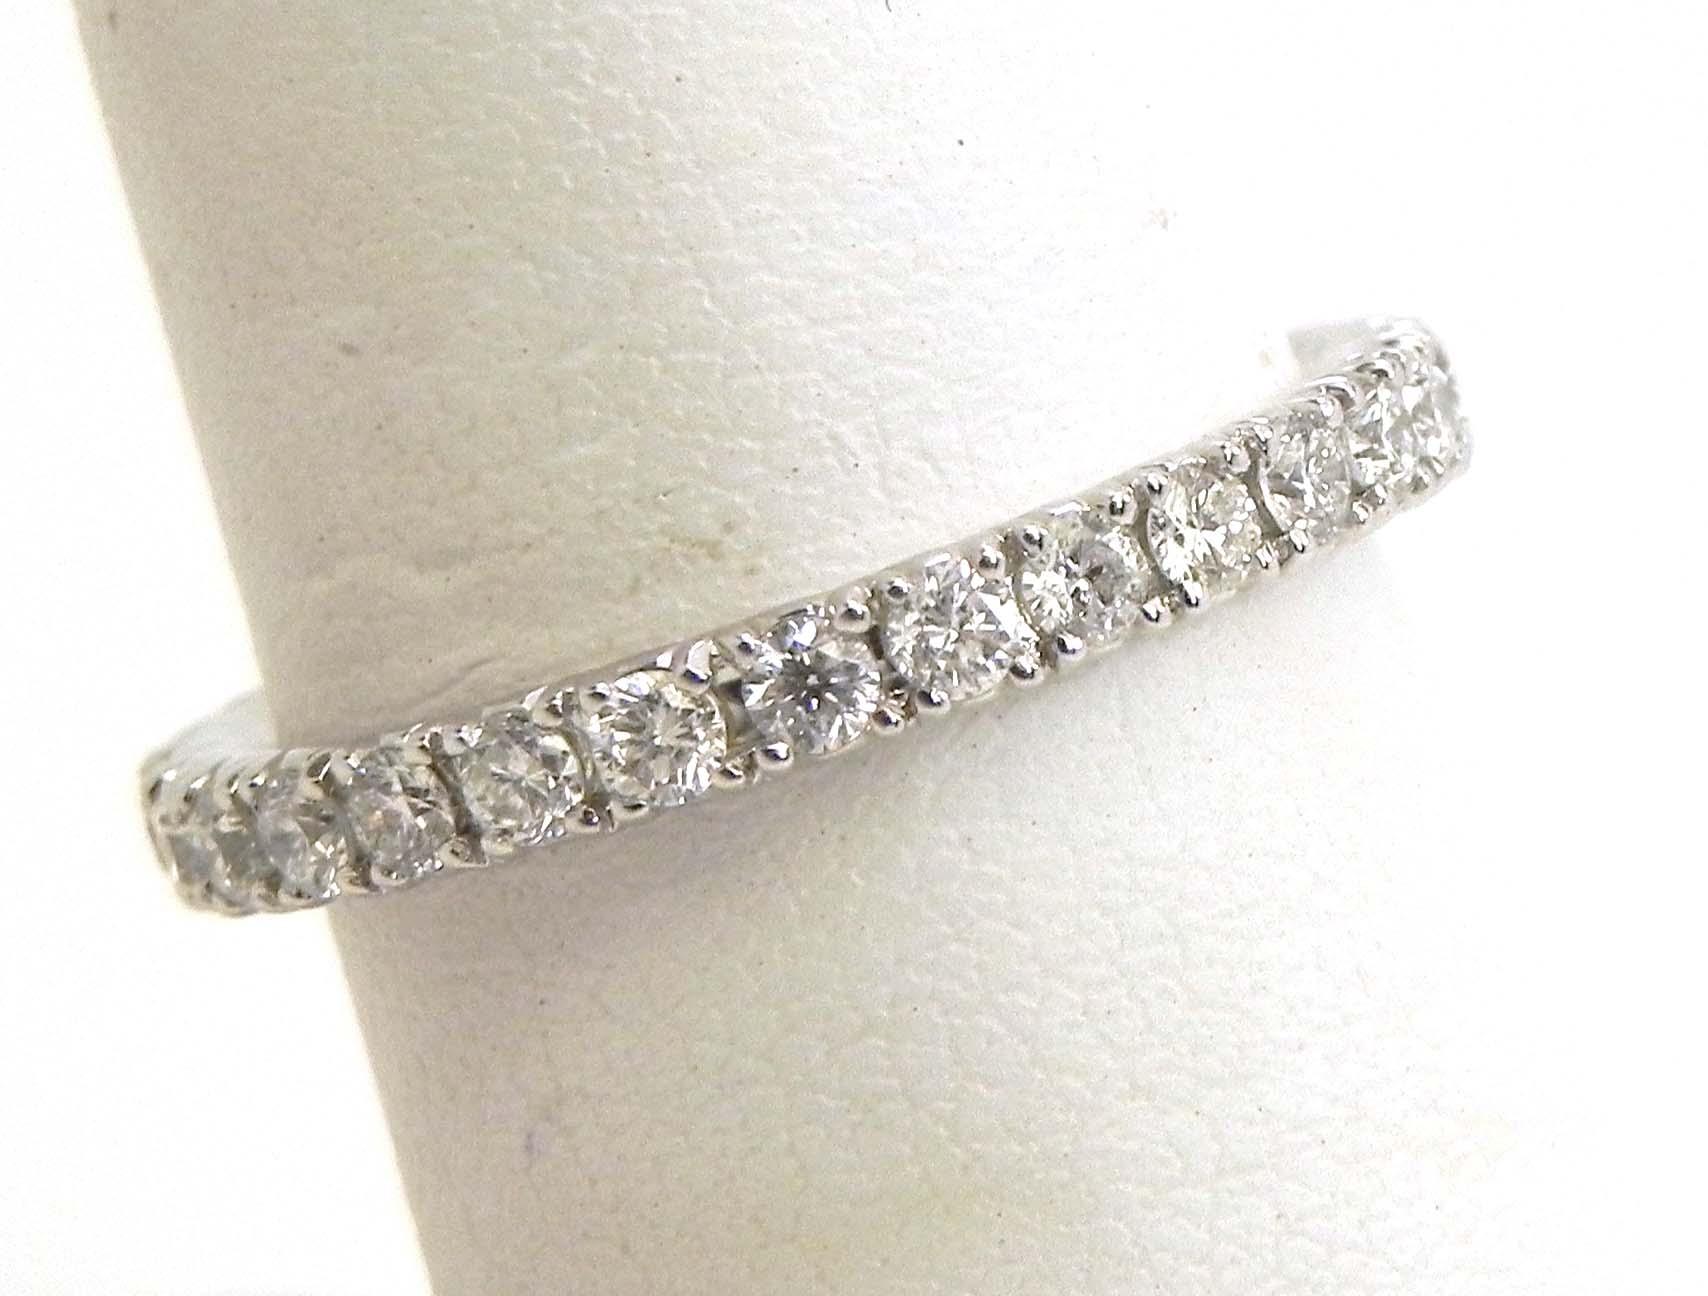 la s 18k white gold diamonds eternity wedding band ring bright